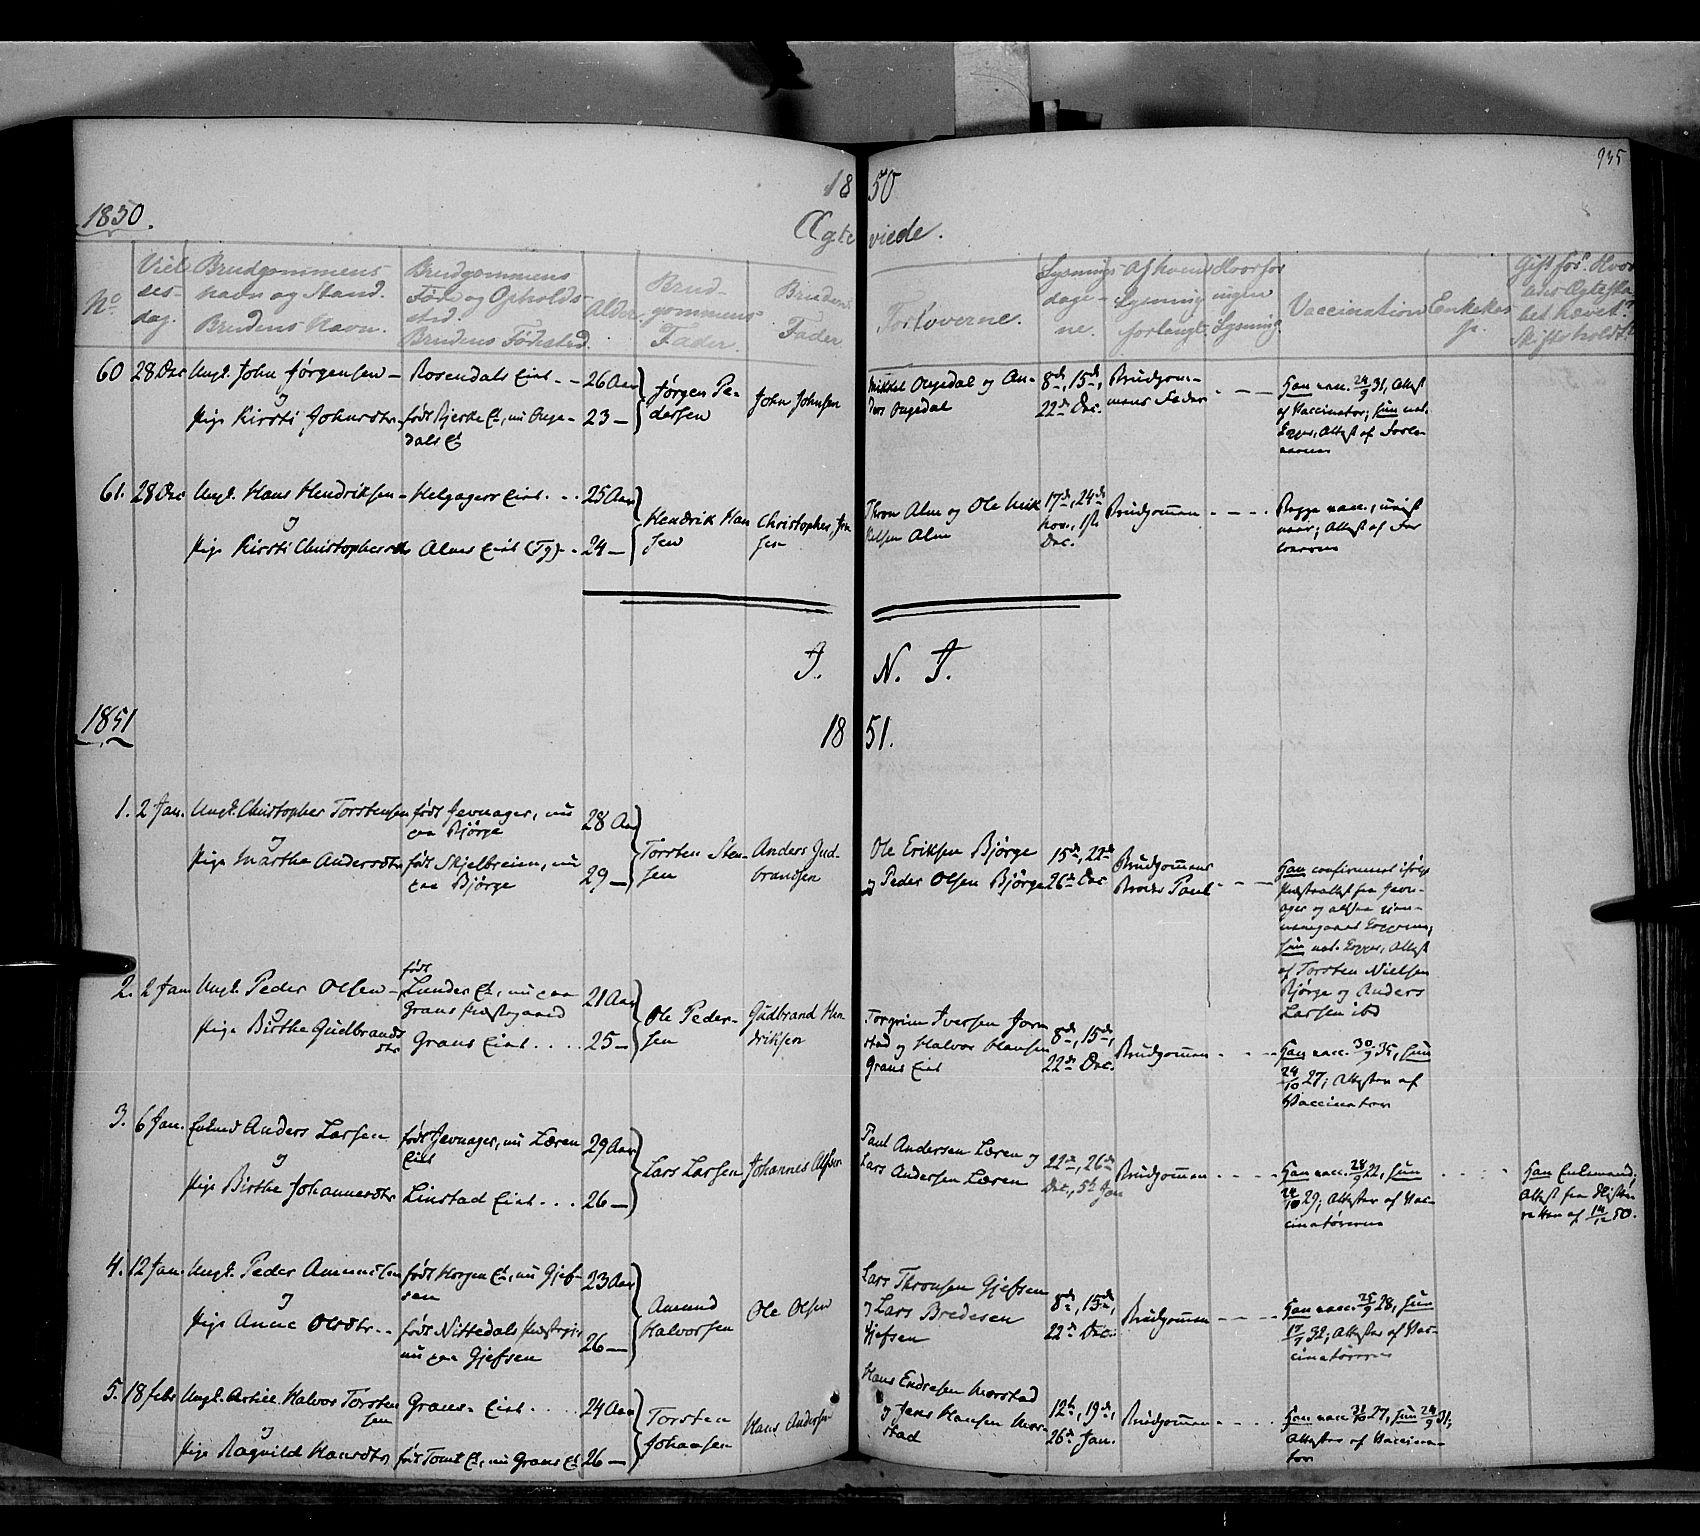 SAH, Gran prestekontor, Ministerialbok nr. 11, 1842-1856, s. 934-935